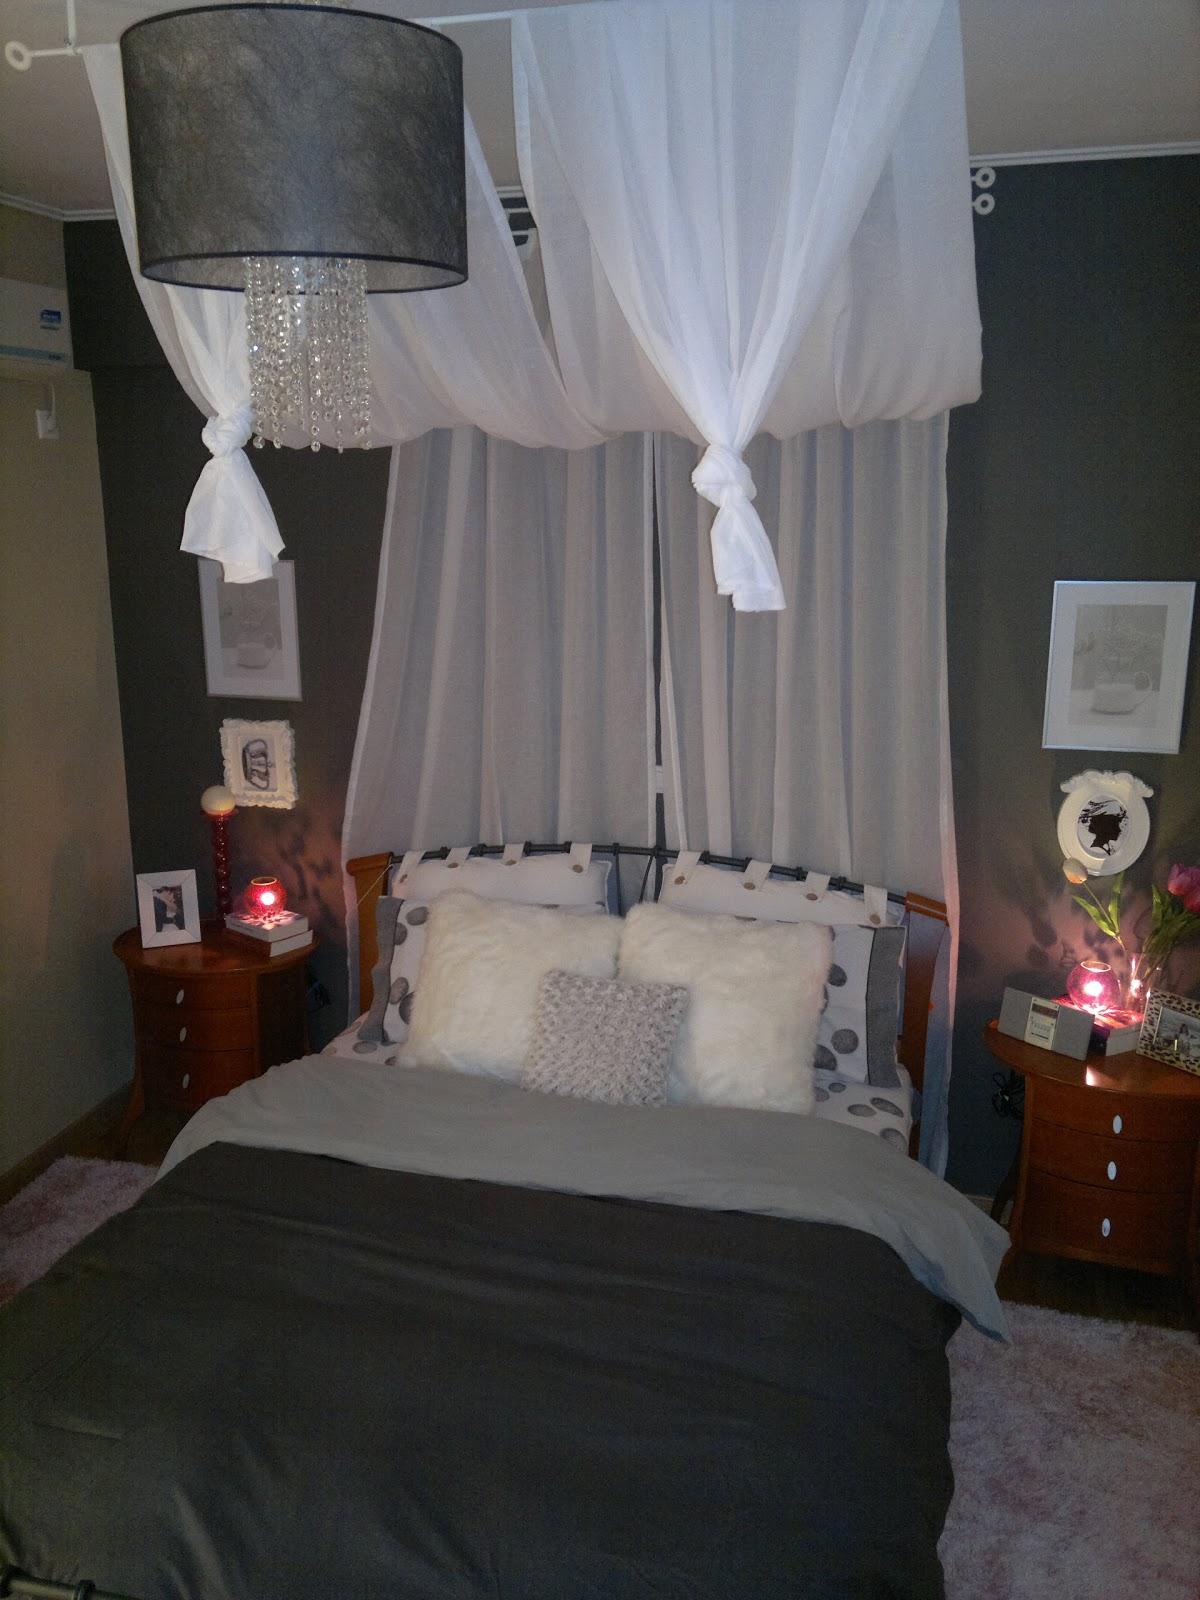 Room Decor: Mystical Bedroom! (my Own Bedroom Transformation)